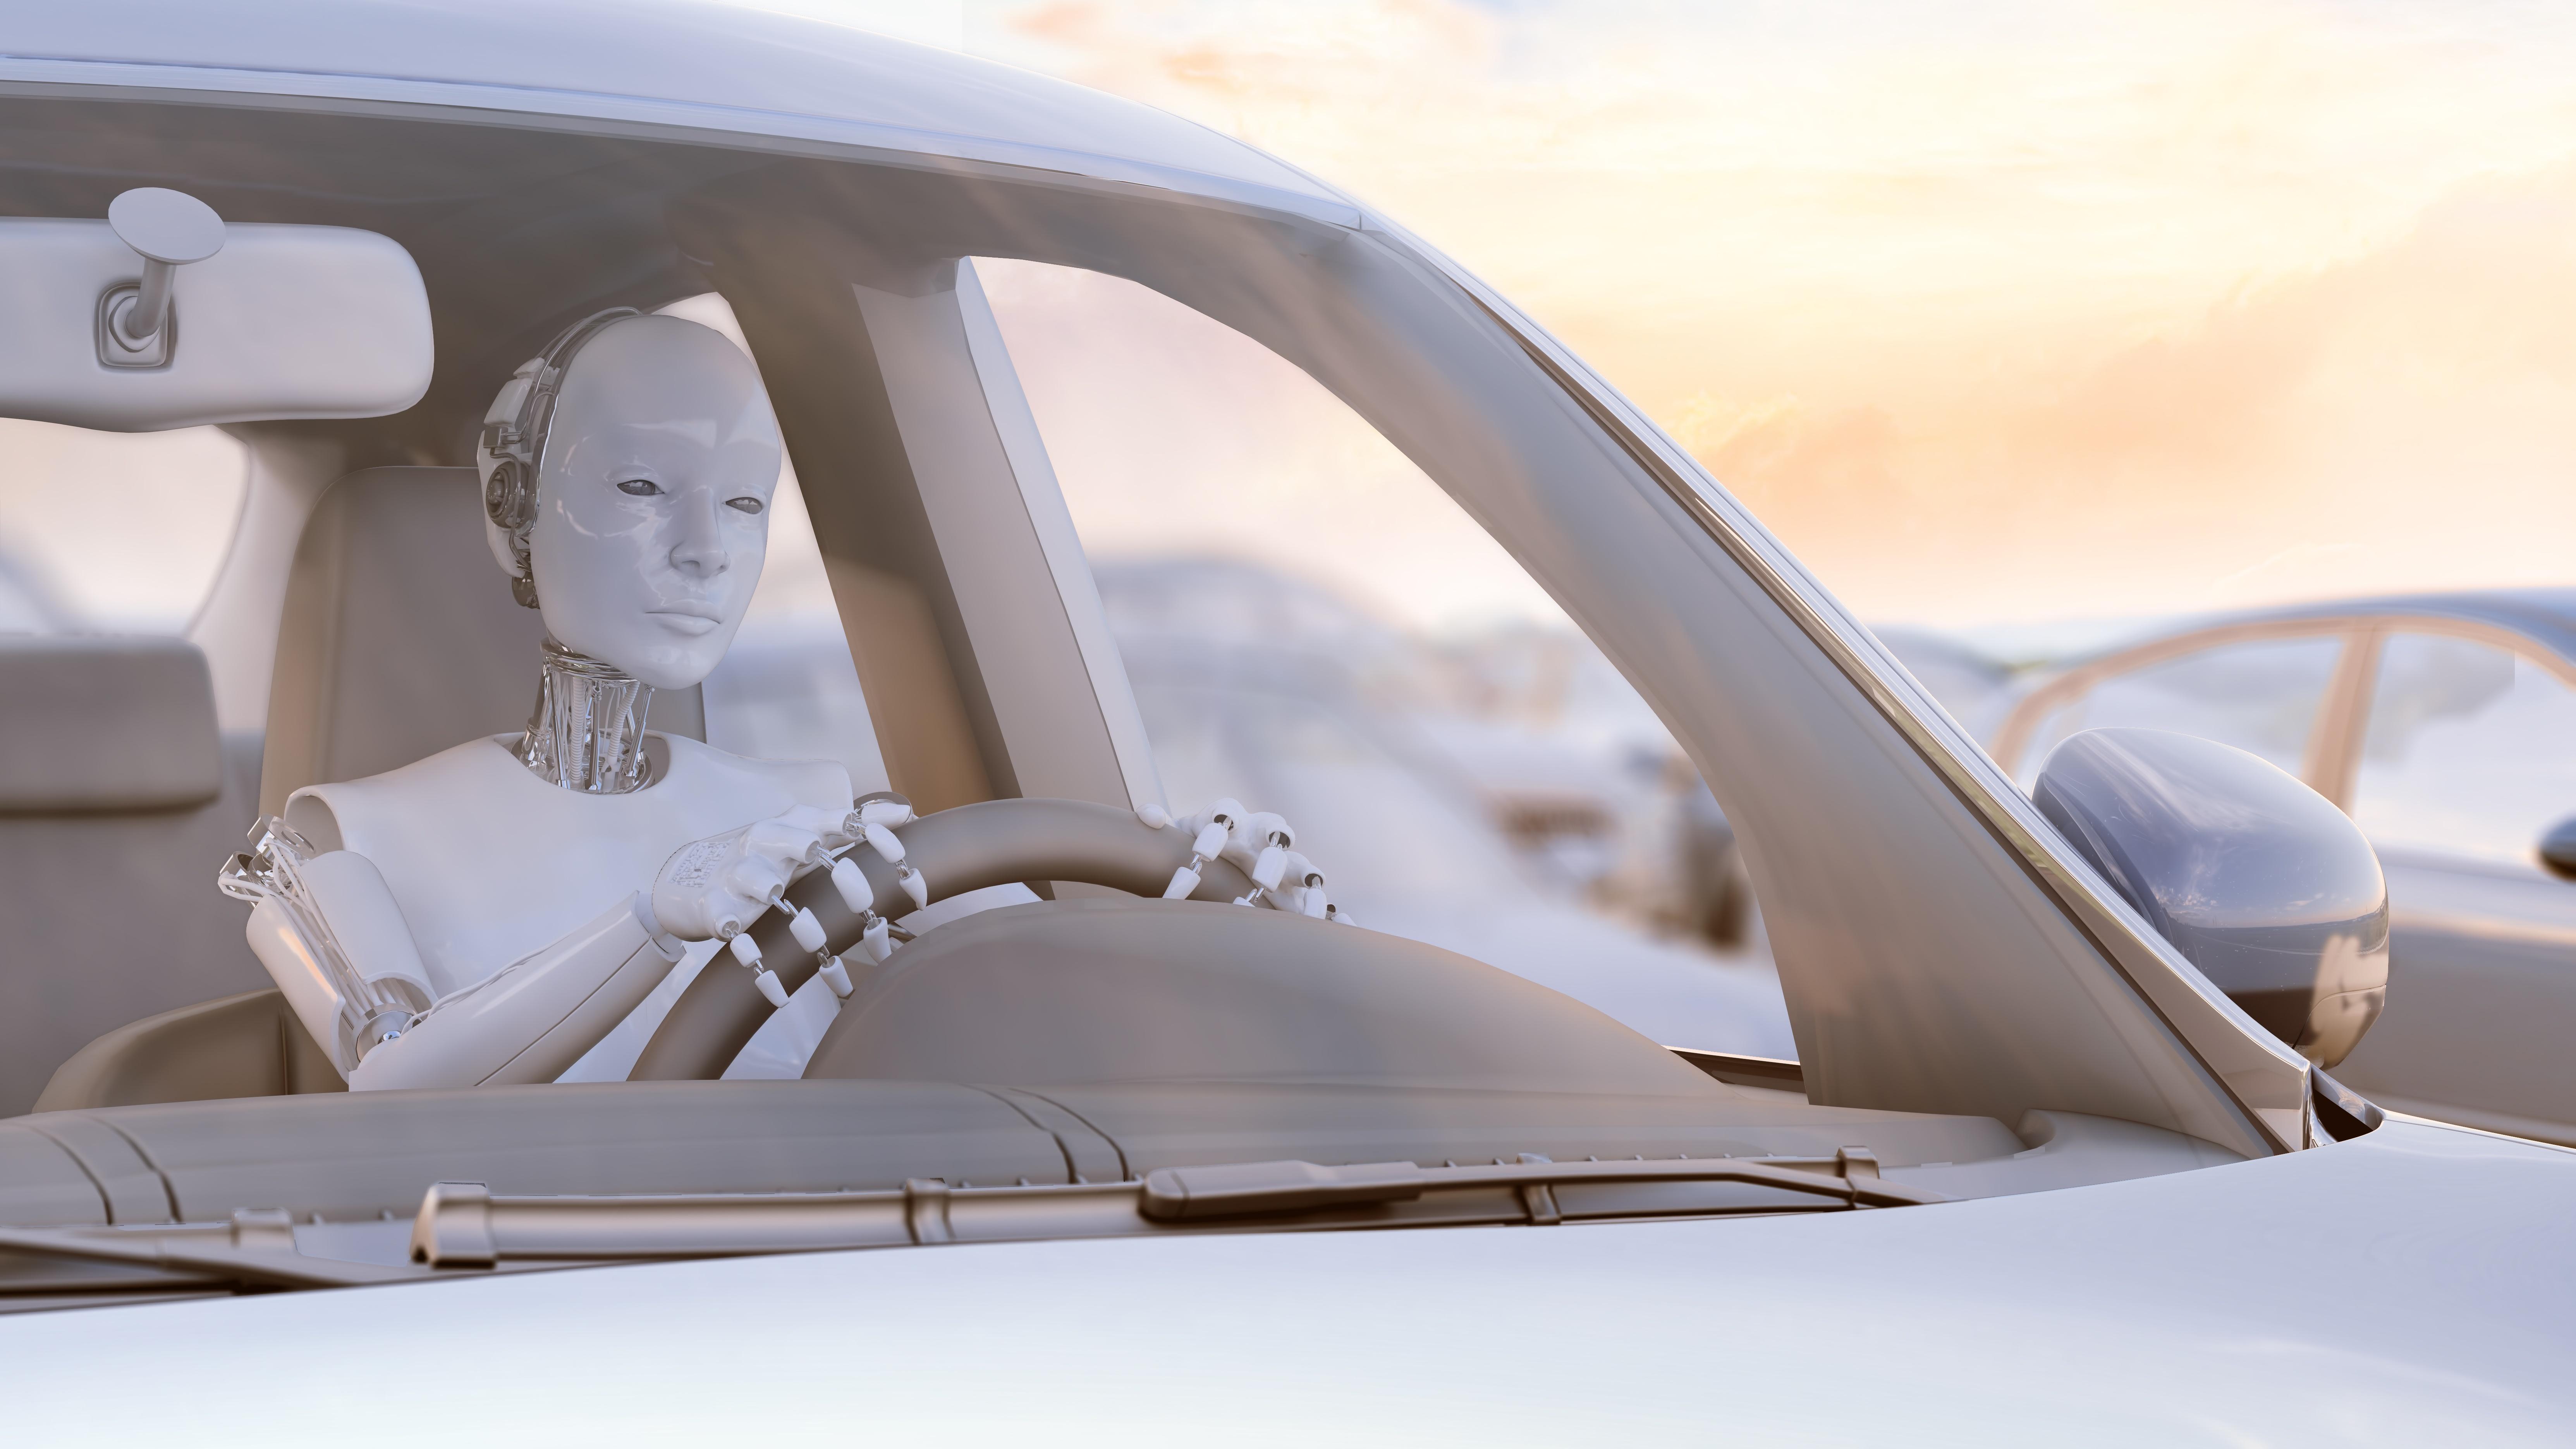 ethics_in_AI_Autonomous_cARS.jpg